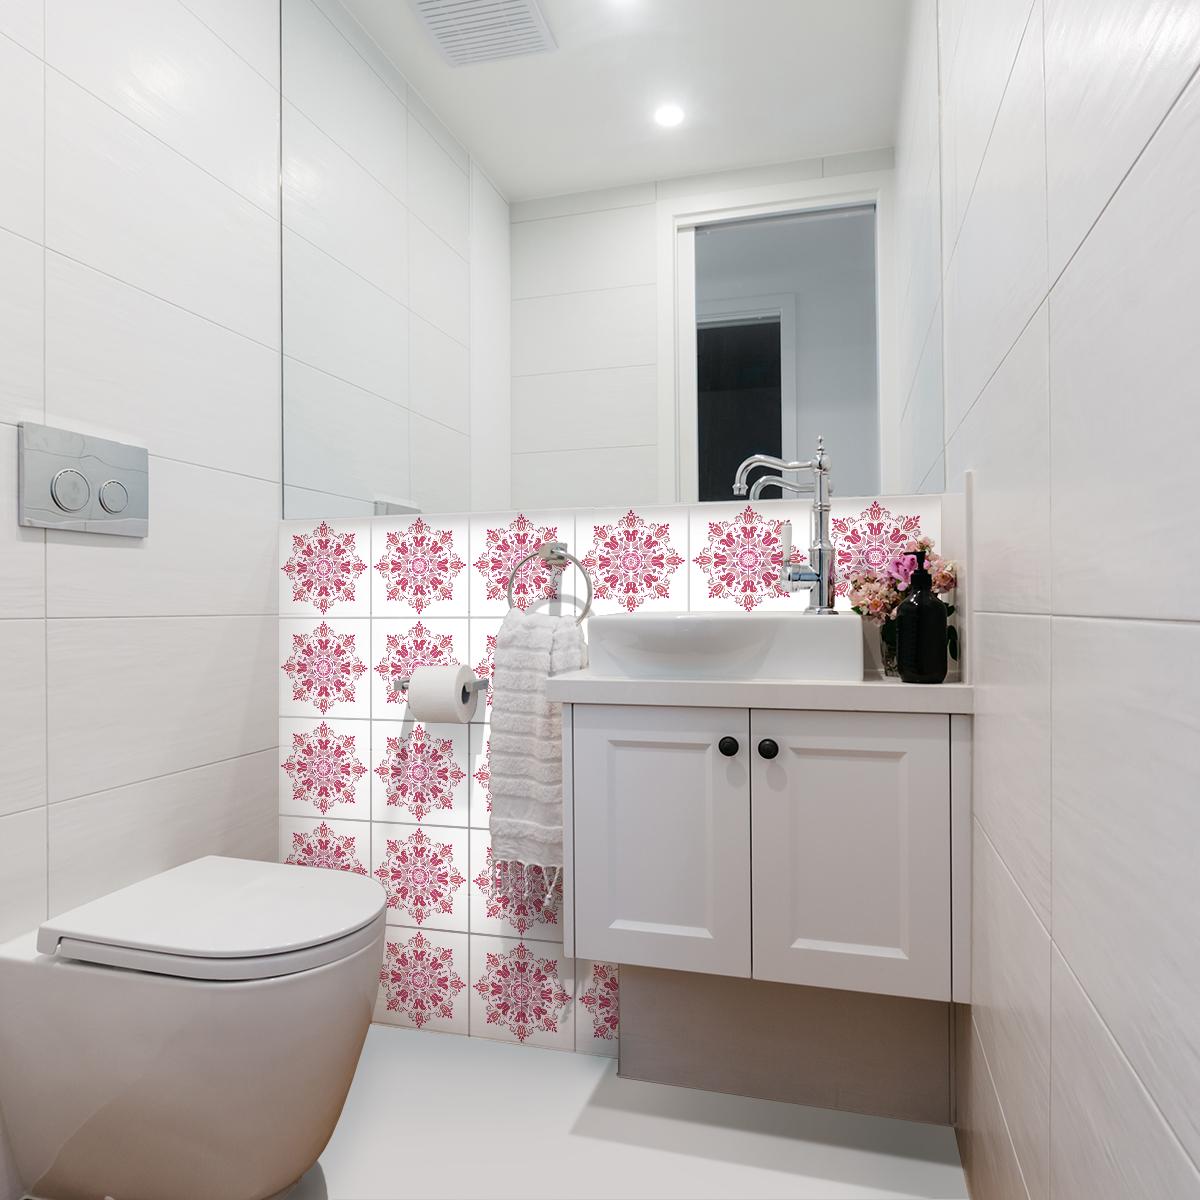 24 stickers carreaux de ciment boh me karukera cuisine. Black Bedroom Furniture Sets. Home Design Ideas